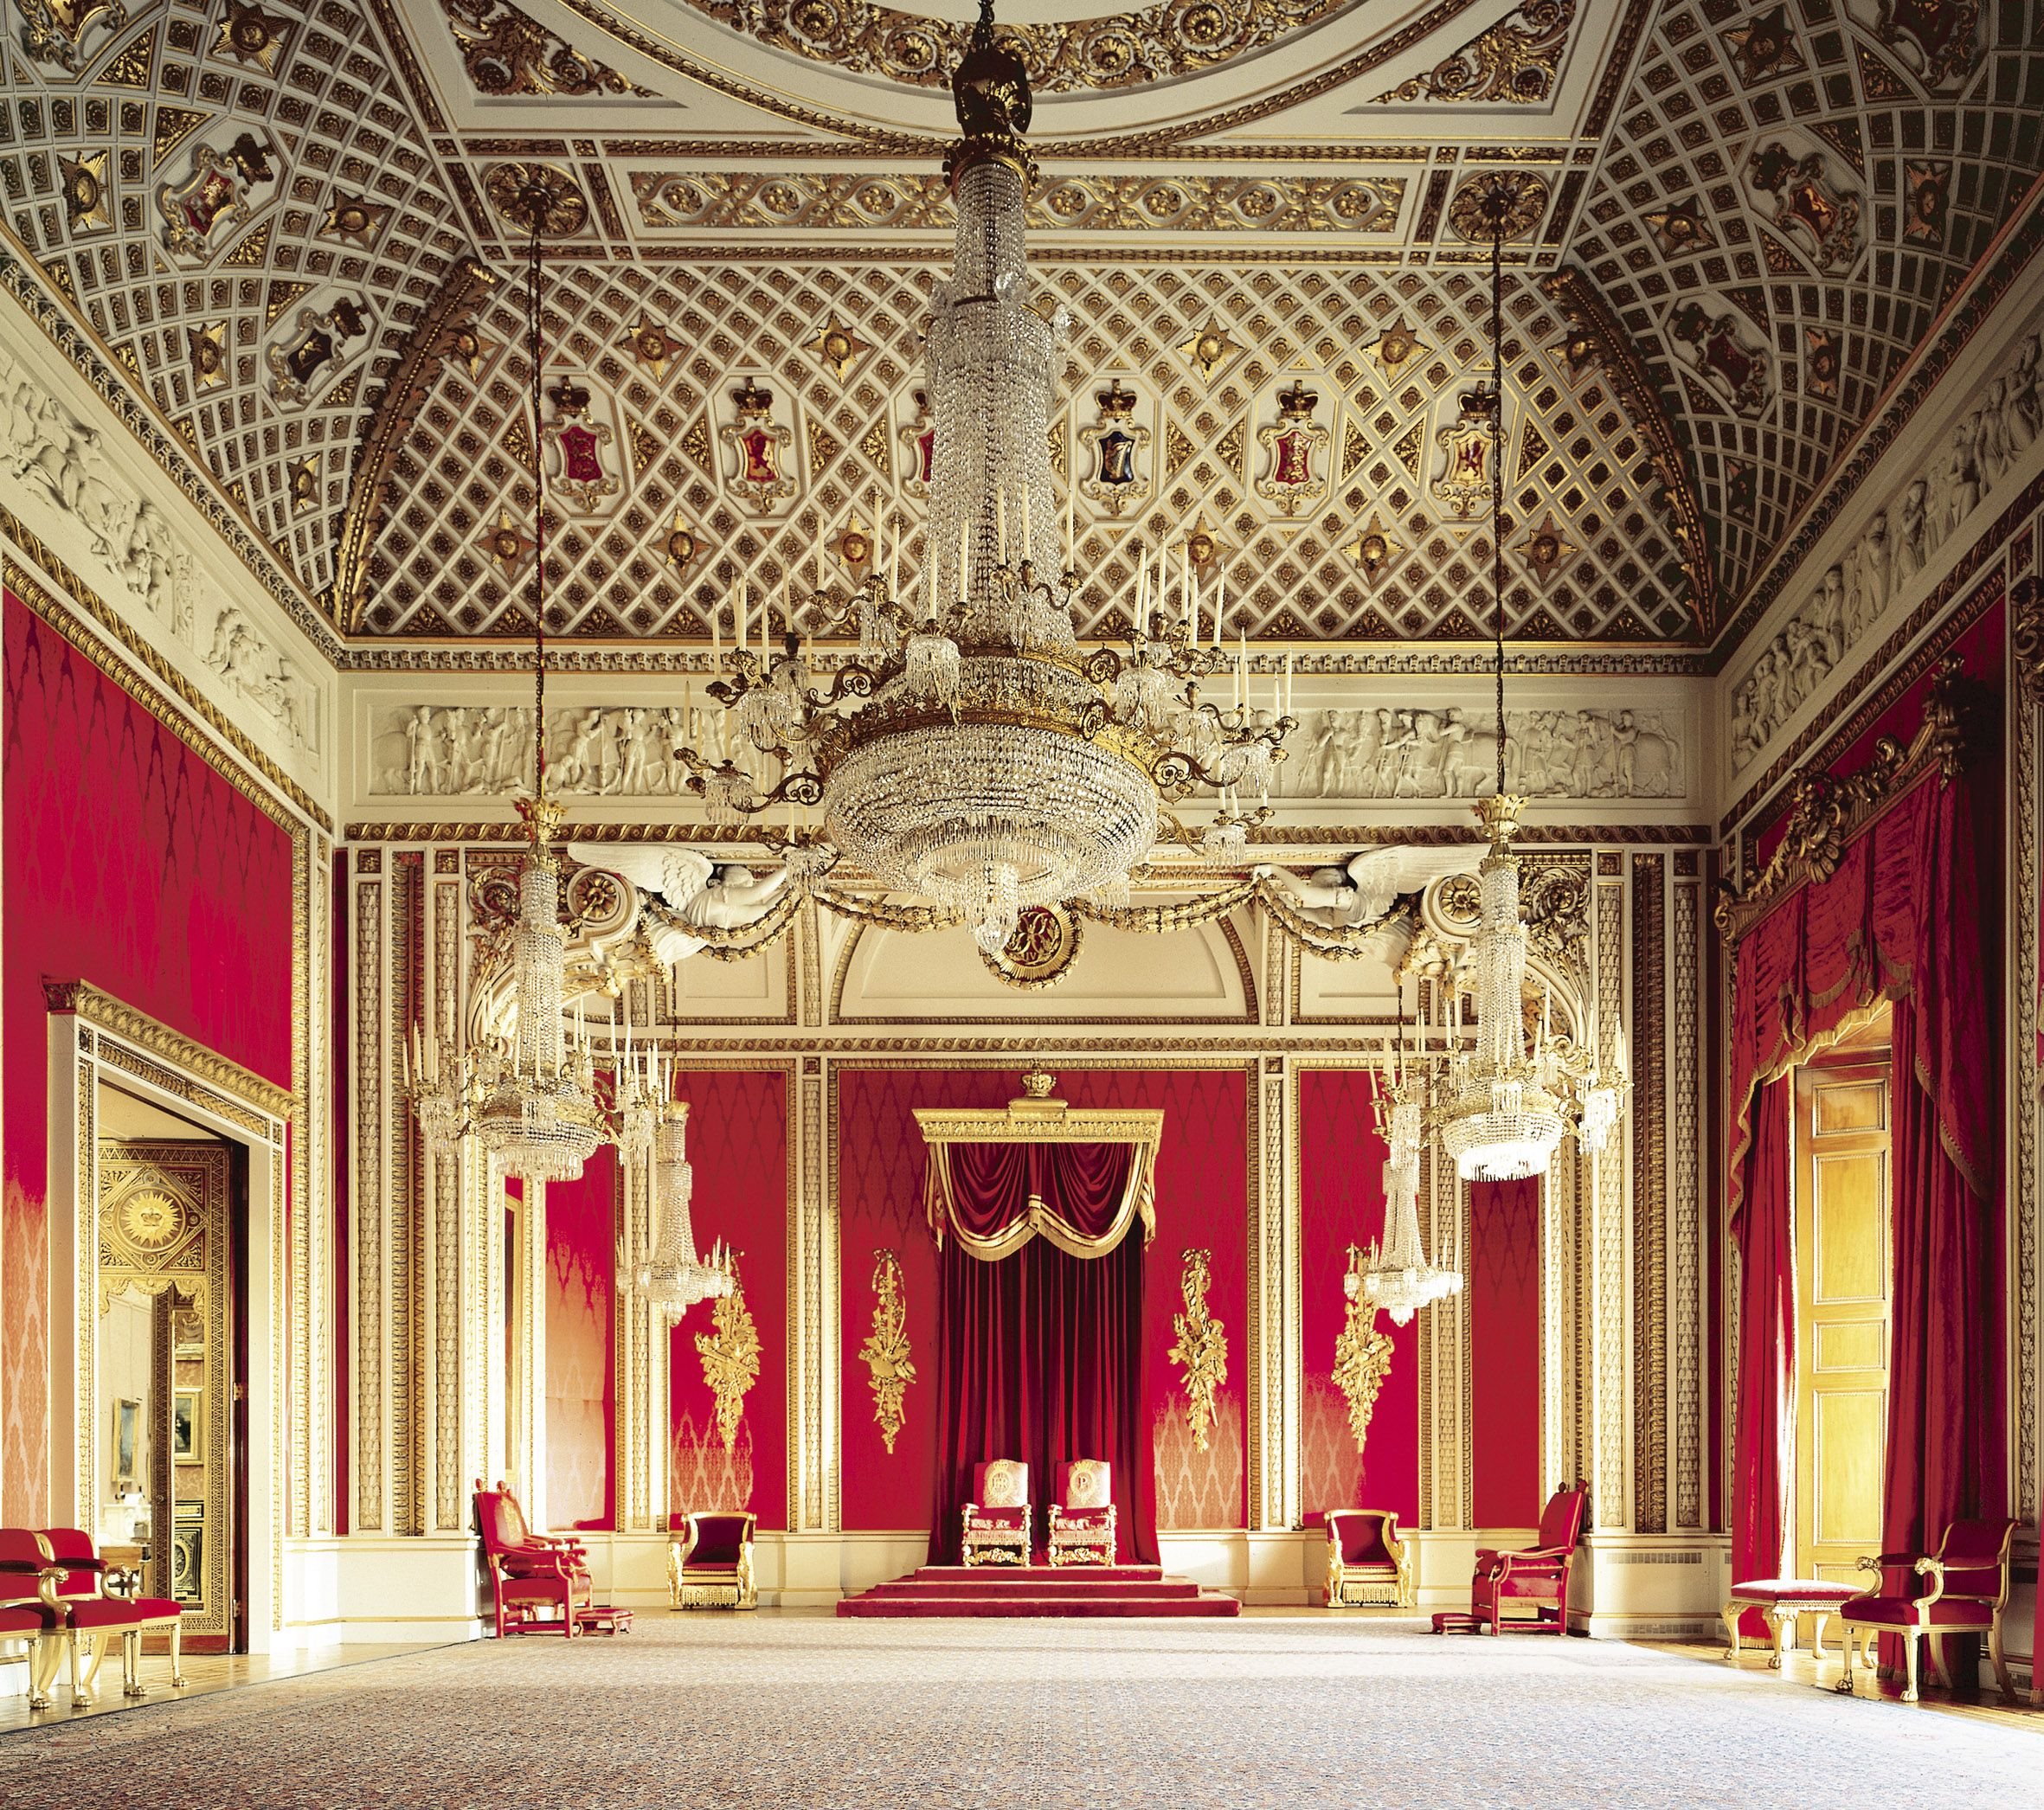 Royal Interiors Buckingham Palace Buckingham Palace London Throne Room